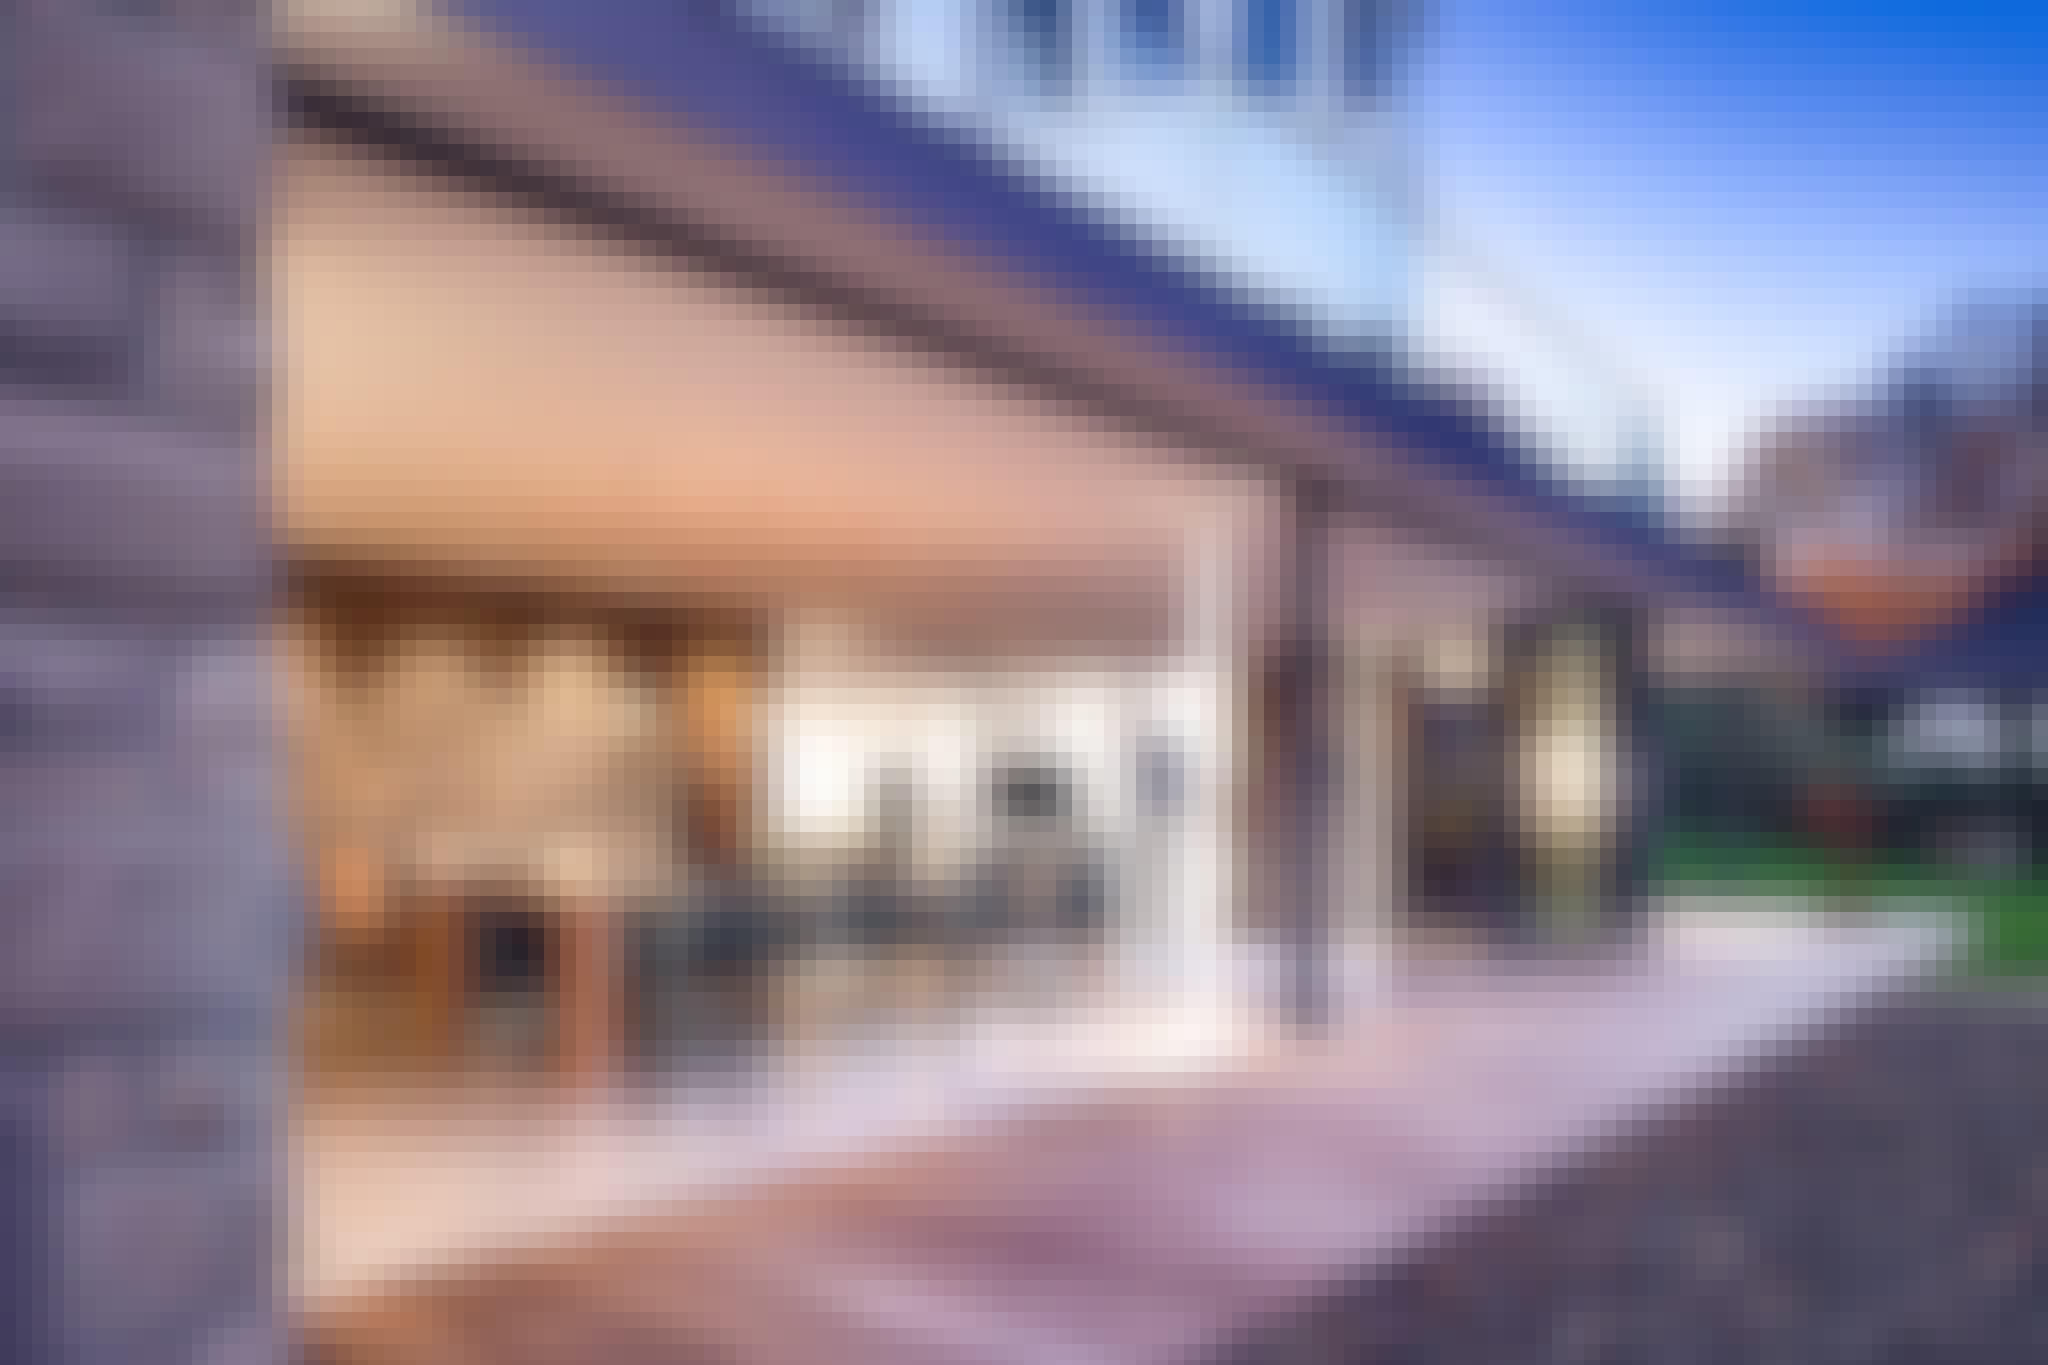 2021 interior design trends home office